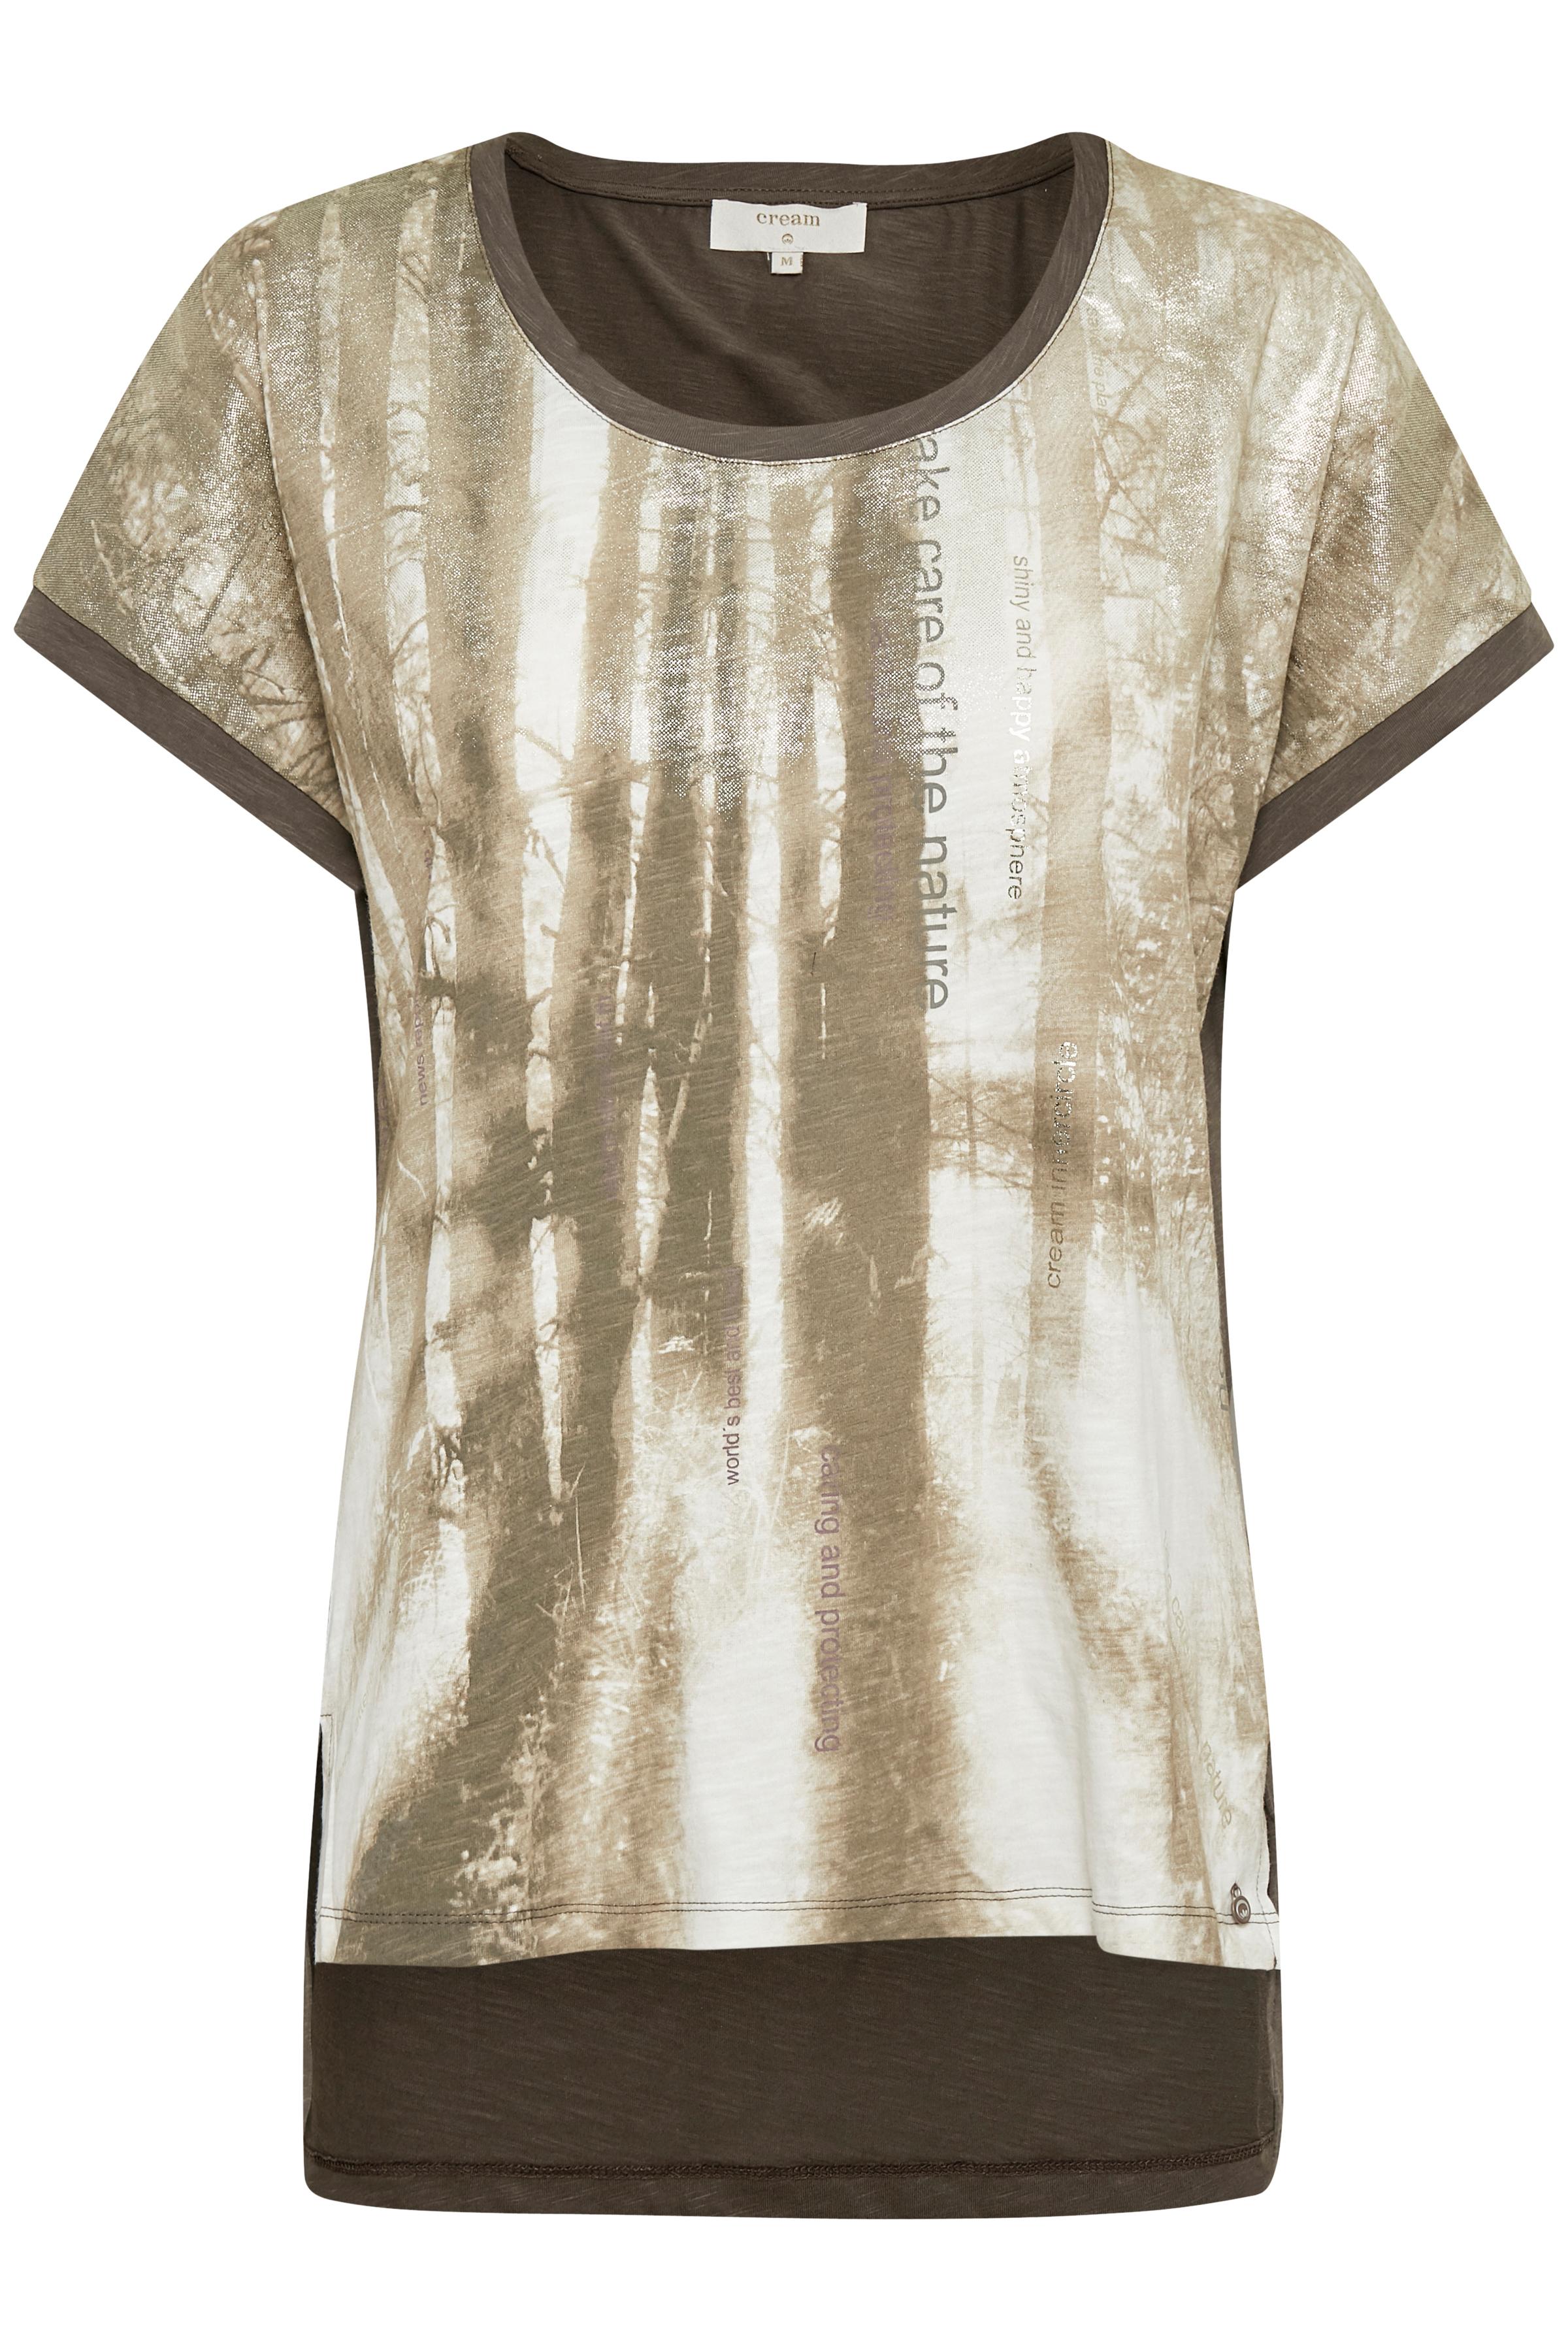 Image of Cream Dame T-shirt - Brun/sand